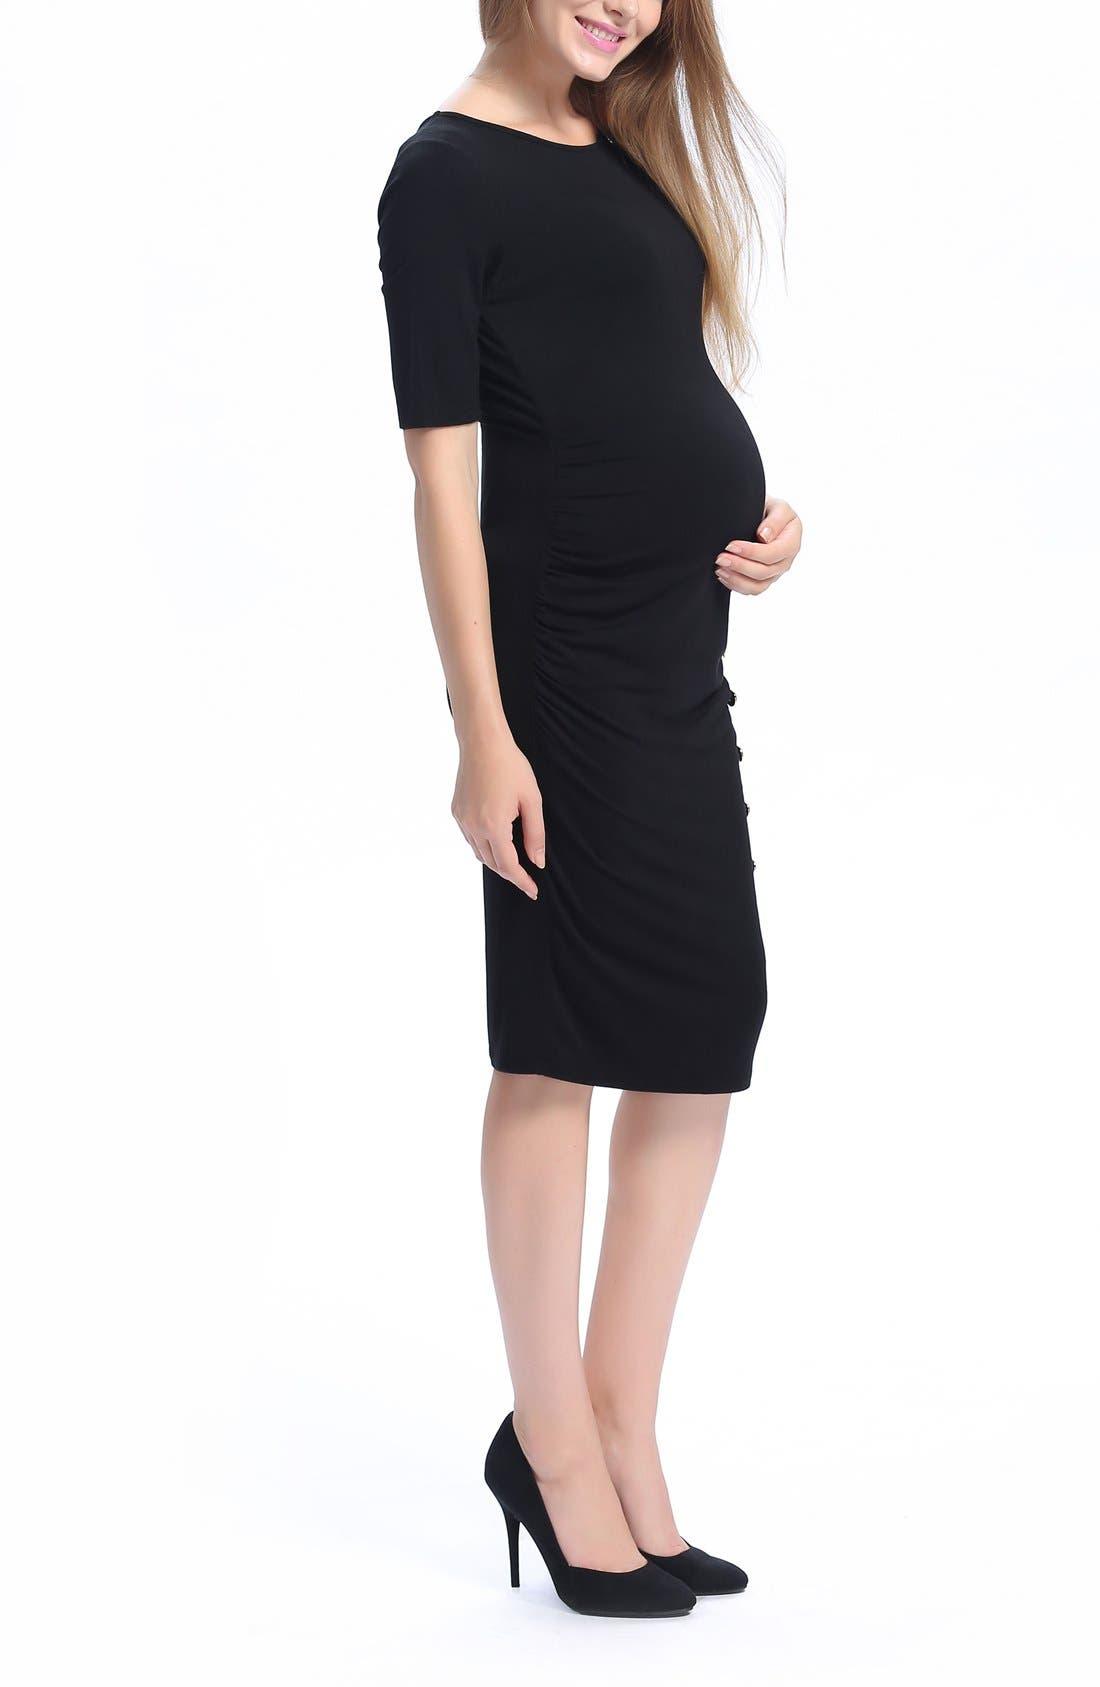 Daphne Colorblock Maternity Dress,                             Alternate thumbnail 5, color,                             Black/ White